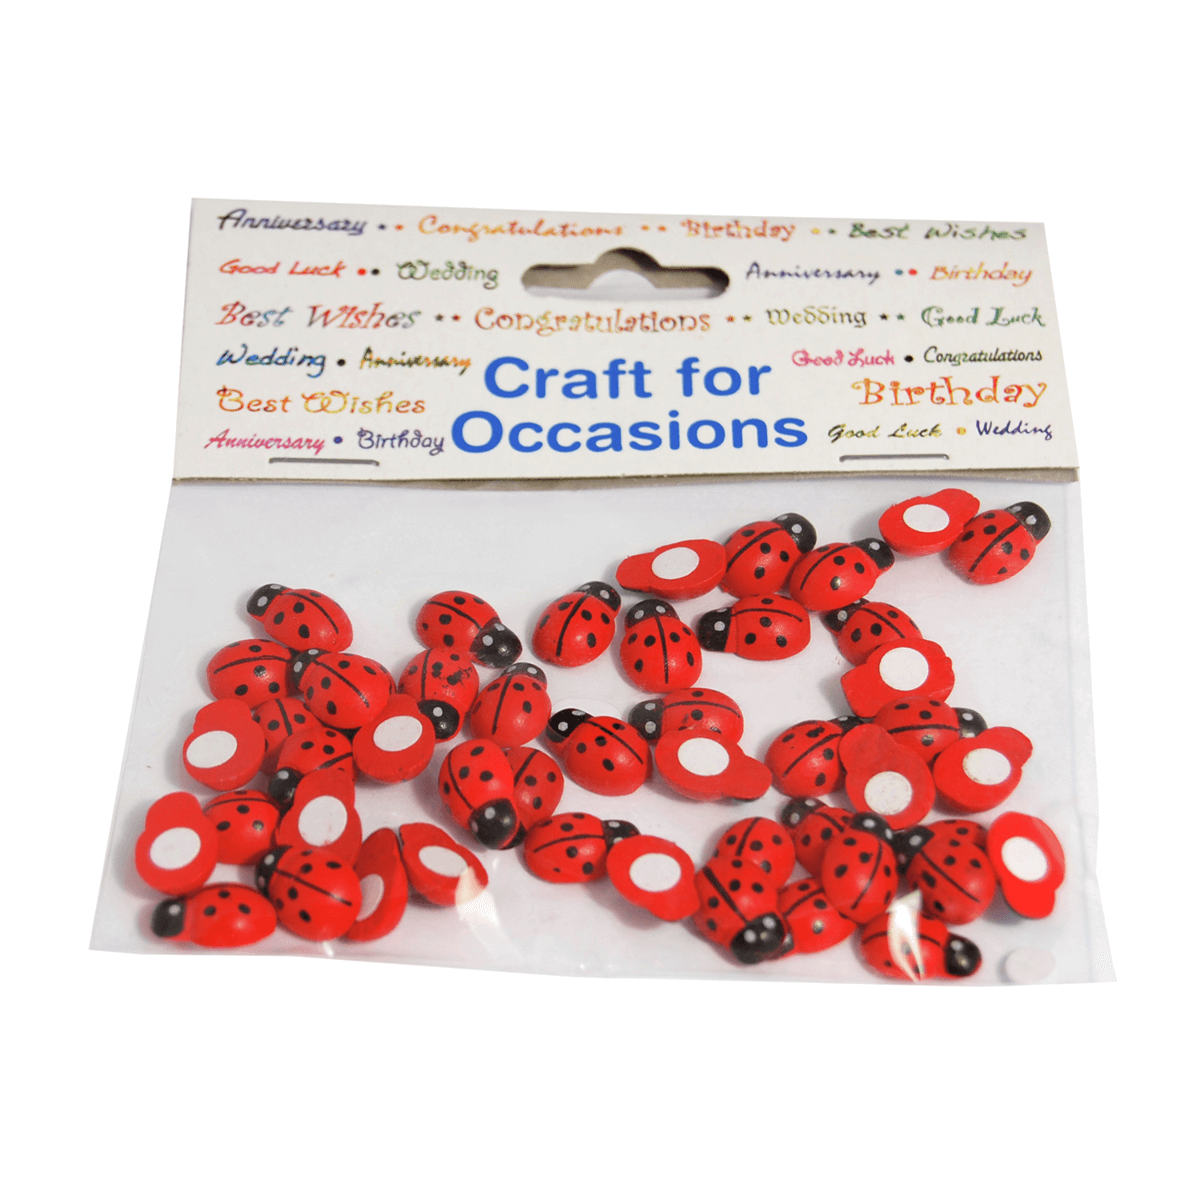 48 x 12mm Red Wooden Ladybird Embellishments Craft Cardmaking Scrapbooking